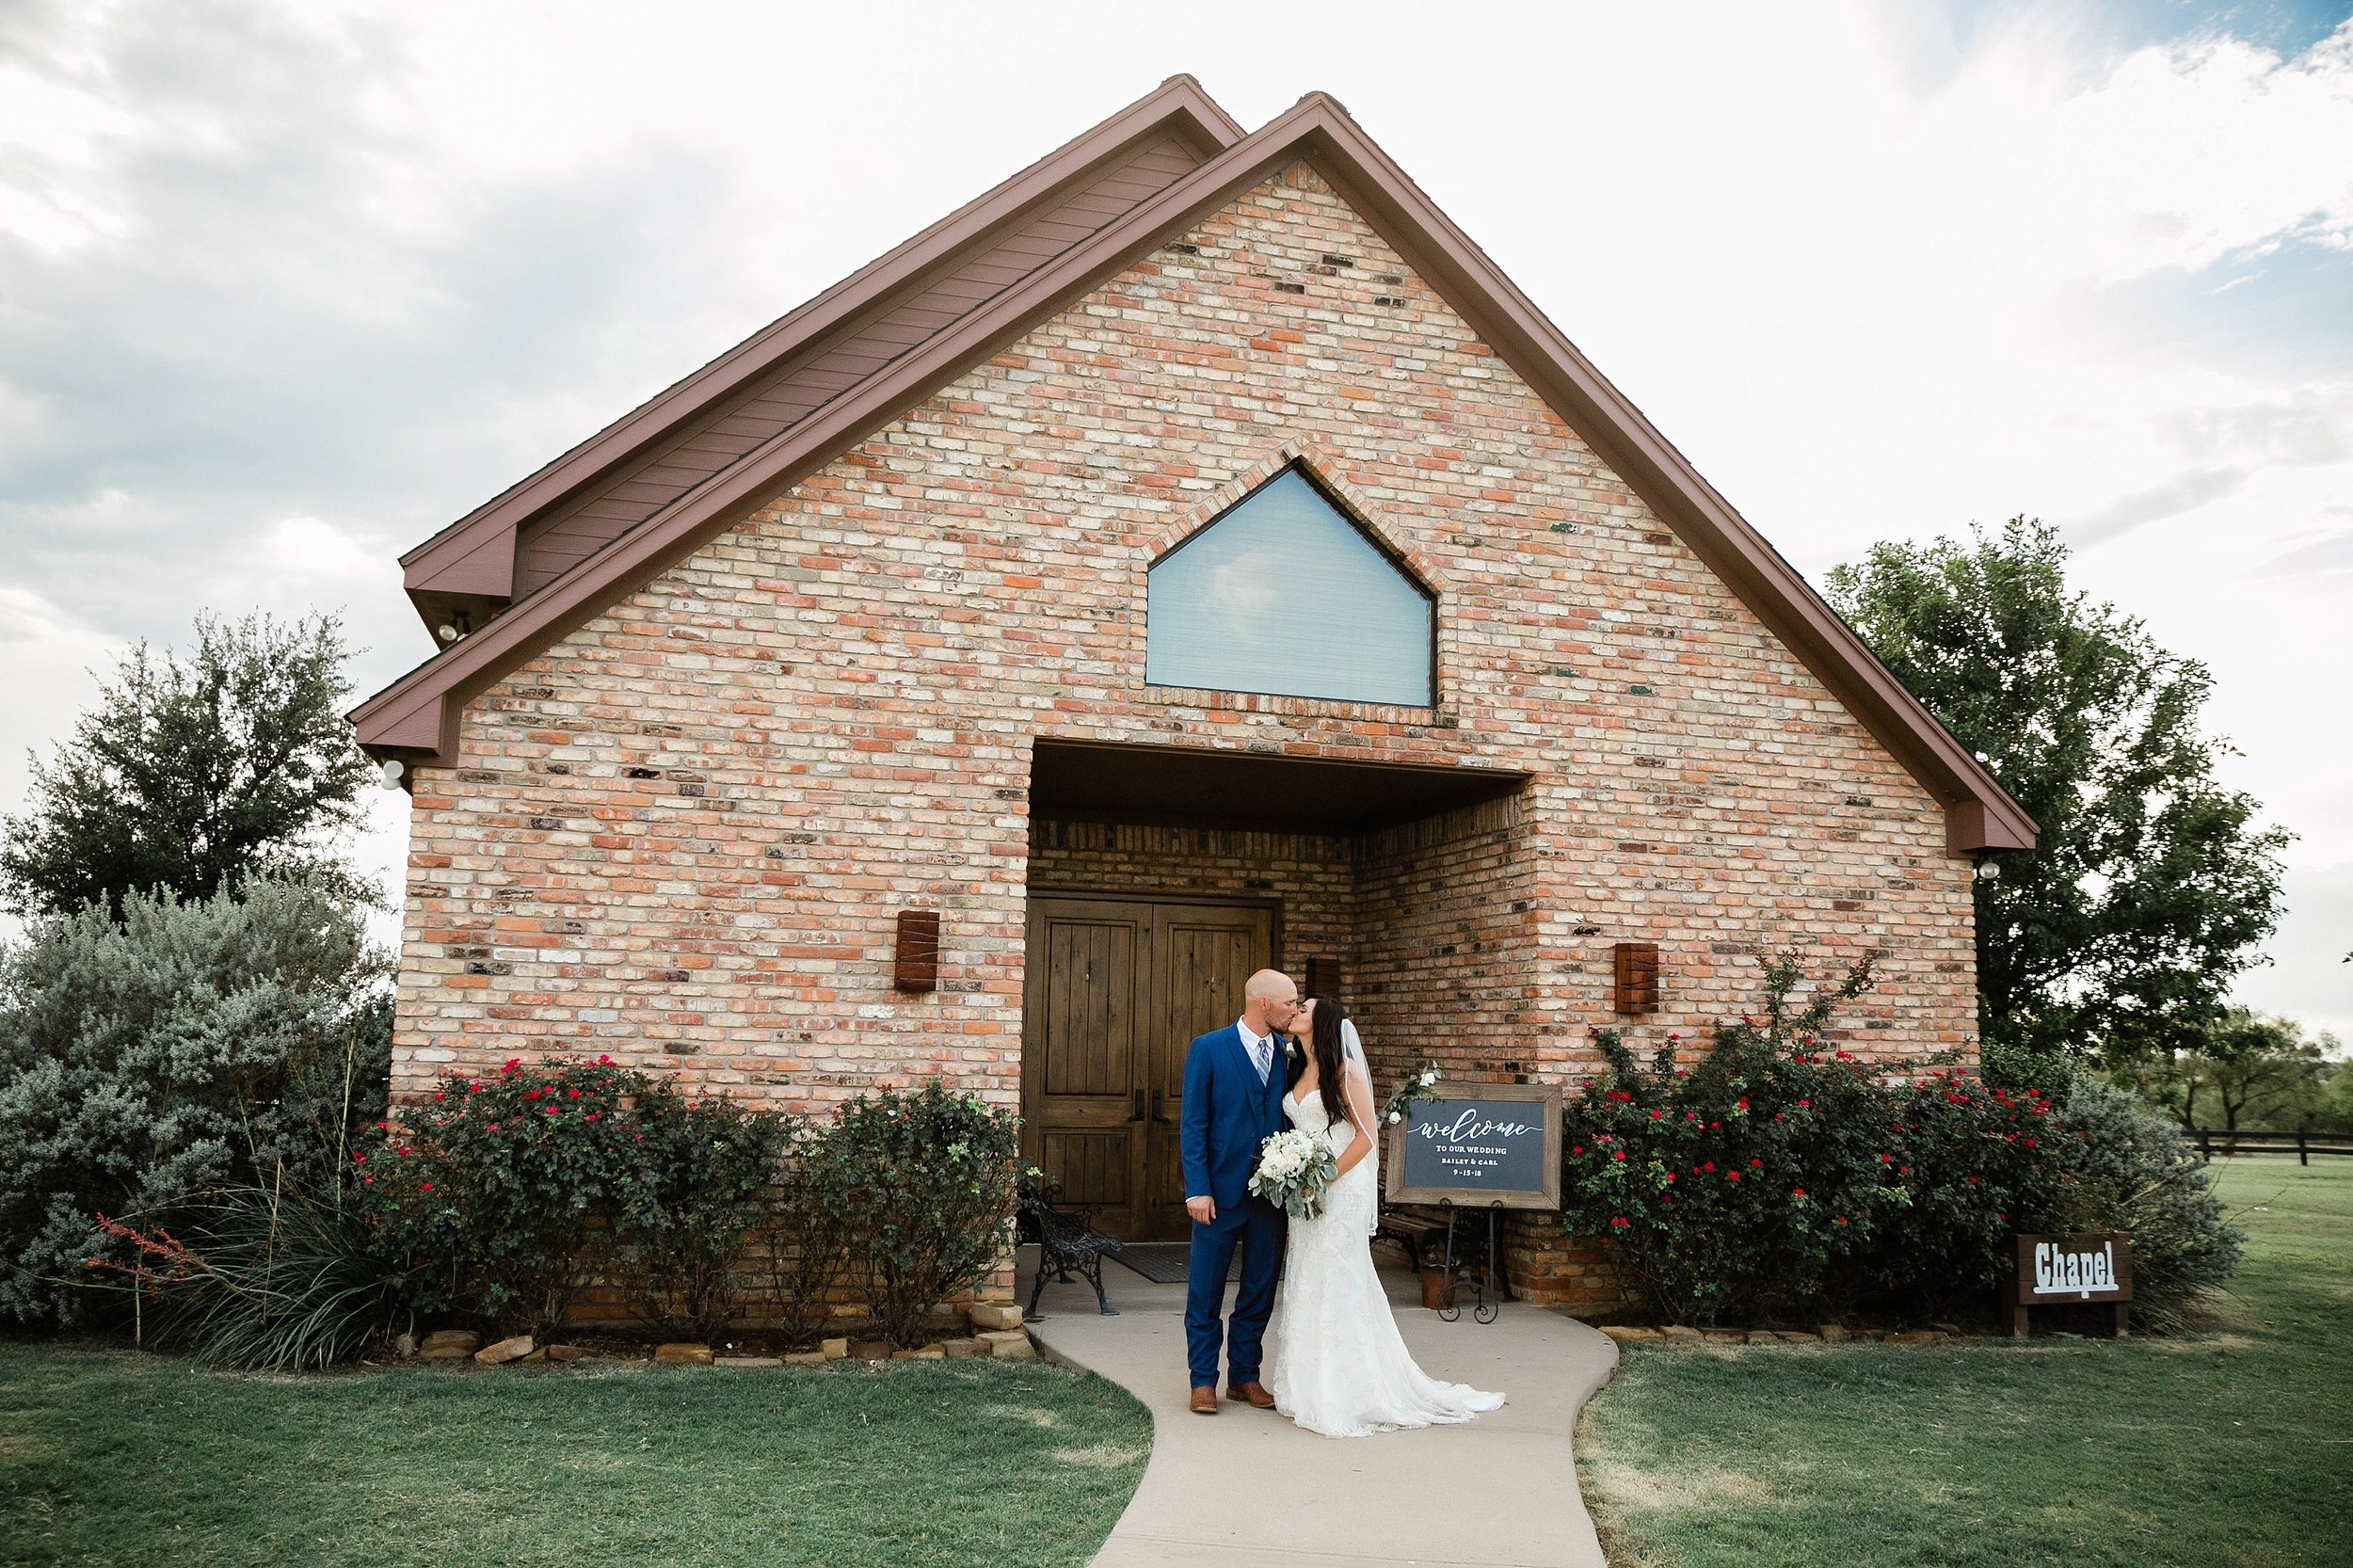 bailey-and-carl-coyote-ranch-resort-wedding-photographer-wichita-falls-texas-destination-wedding-0049.jpg